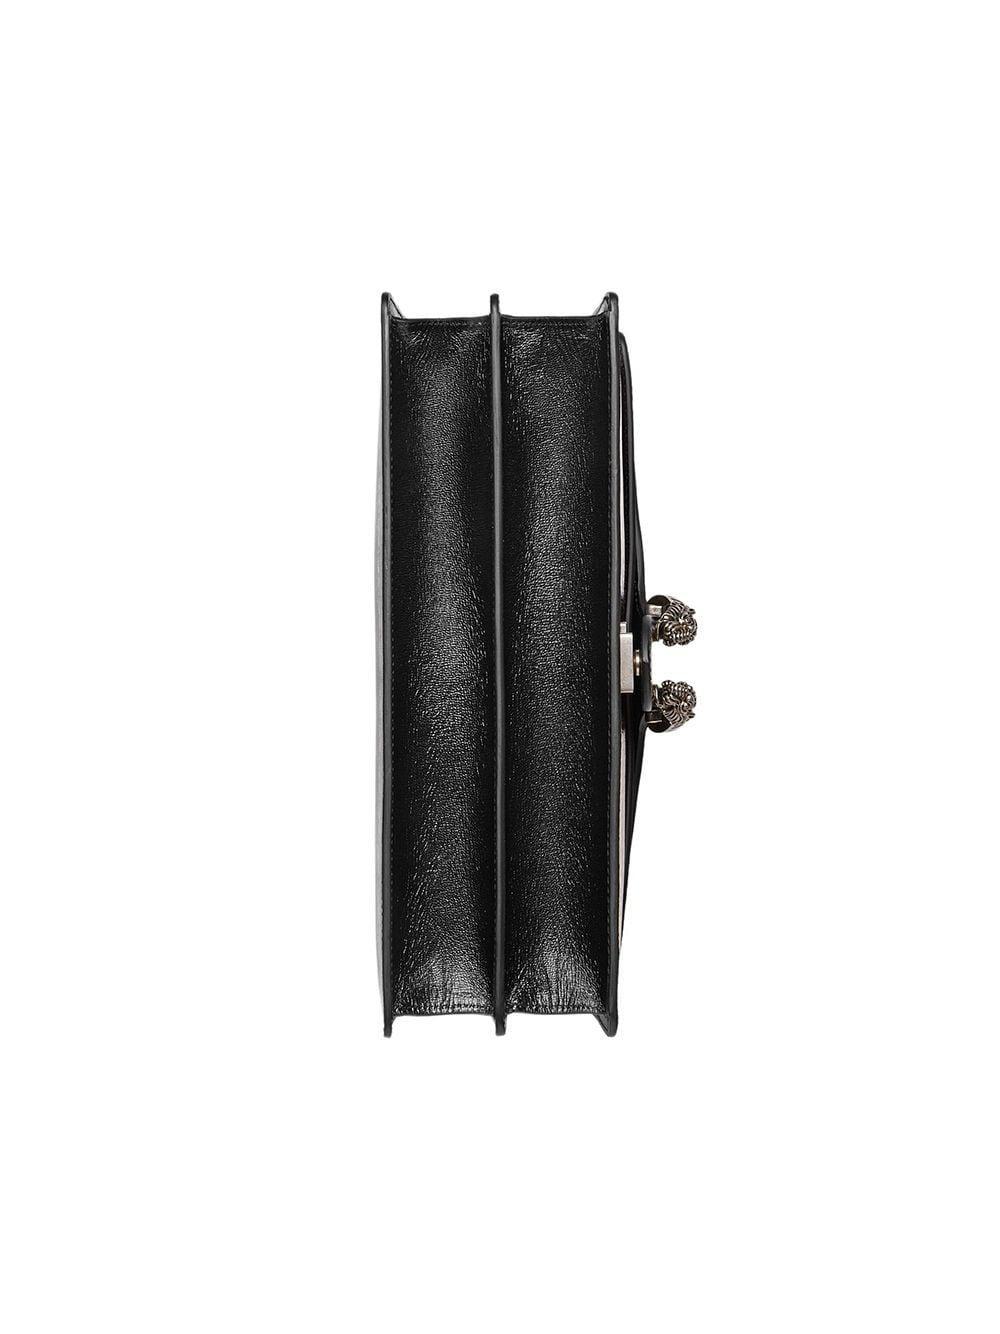 Lyst - Medium Guccy Dionysus shoulder bag Gucci en coloris Noir 7295b2ab4be